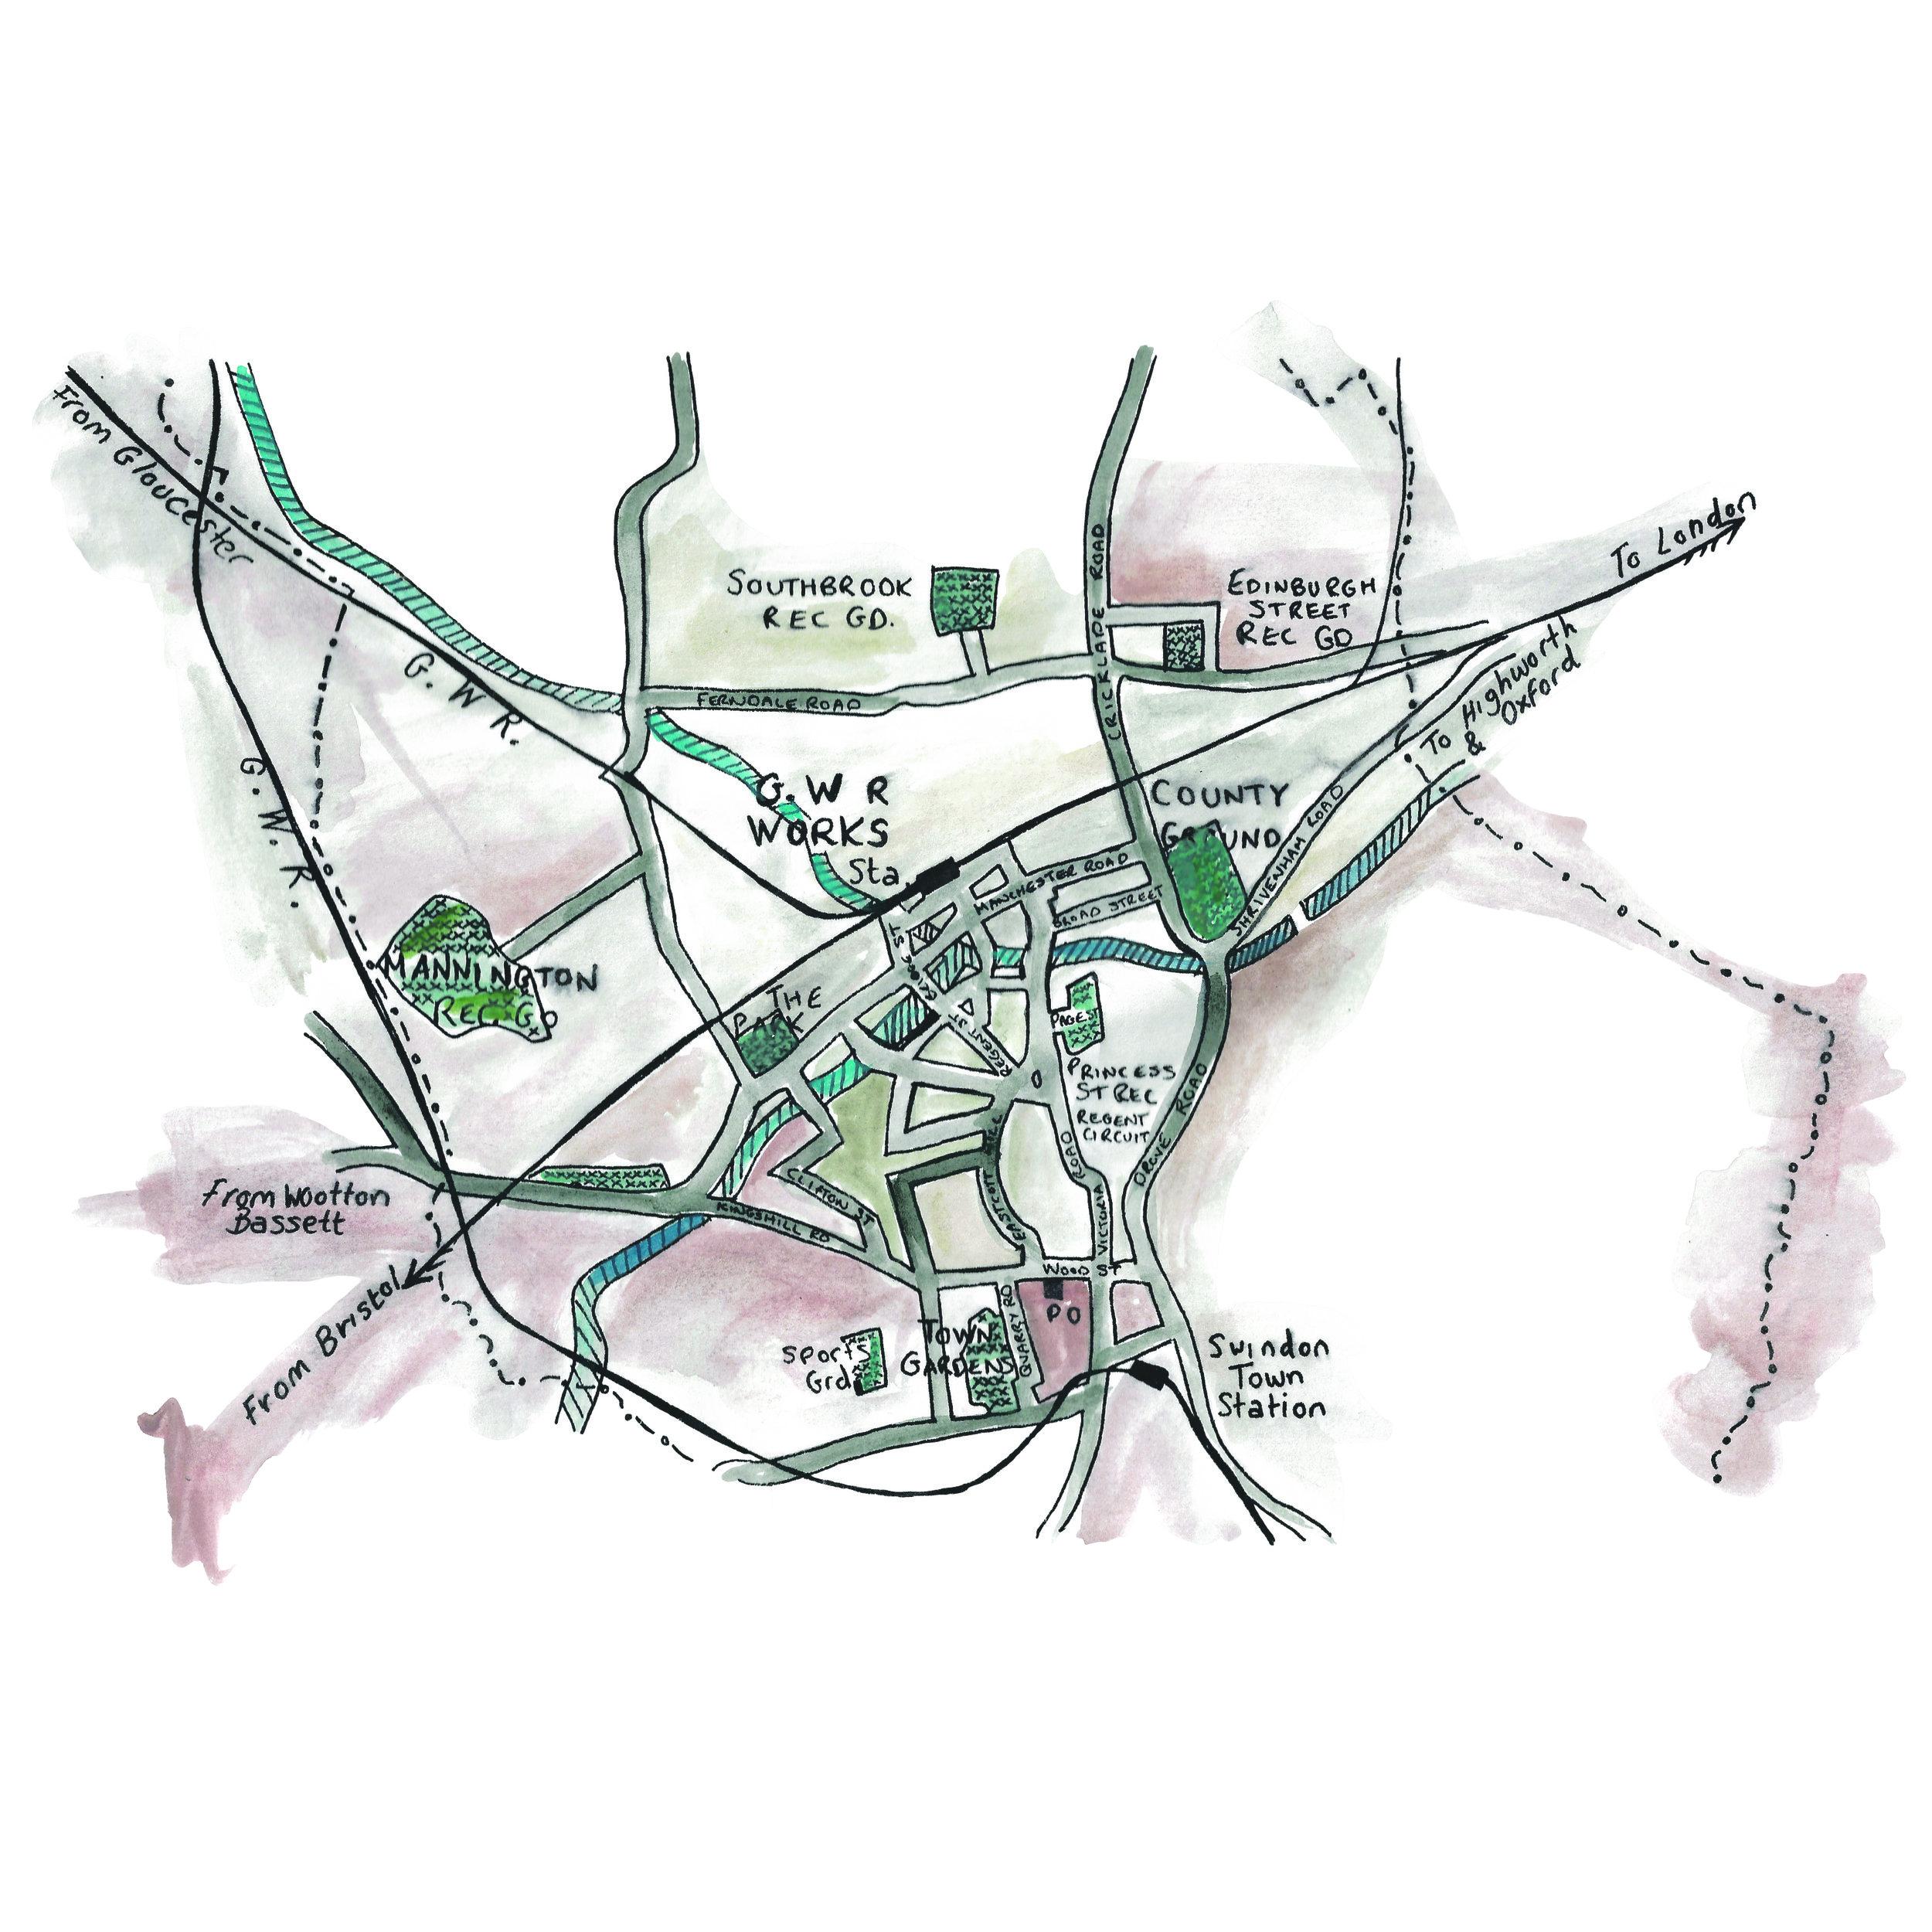 Map of Swindon